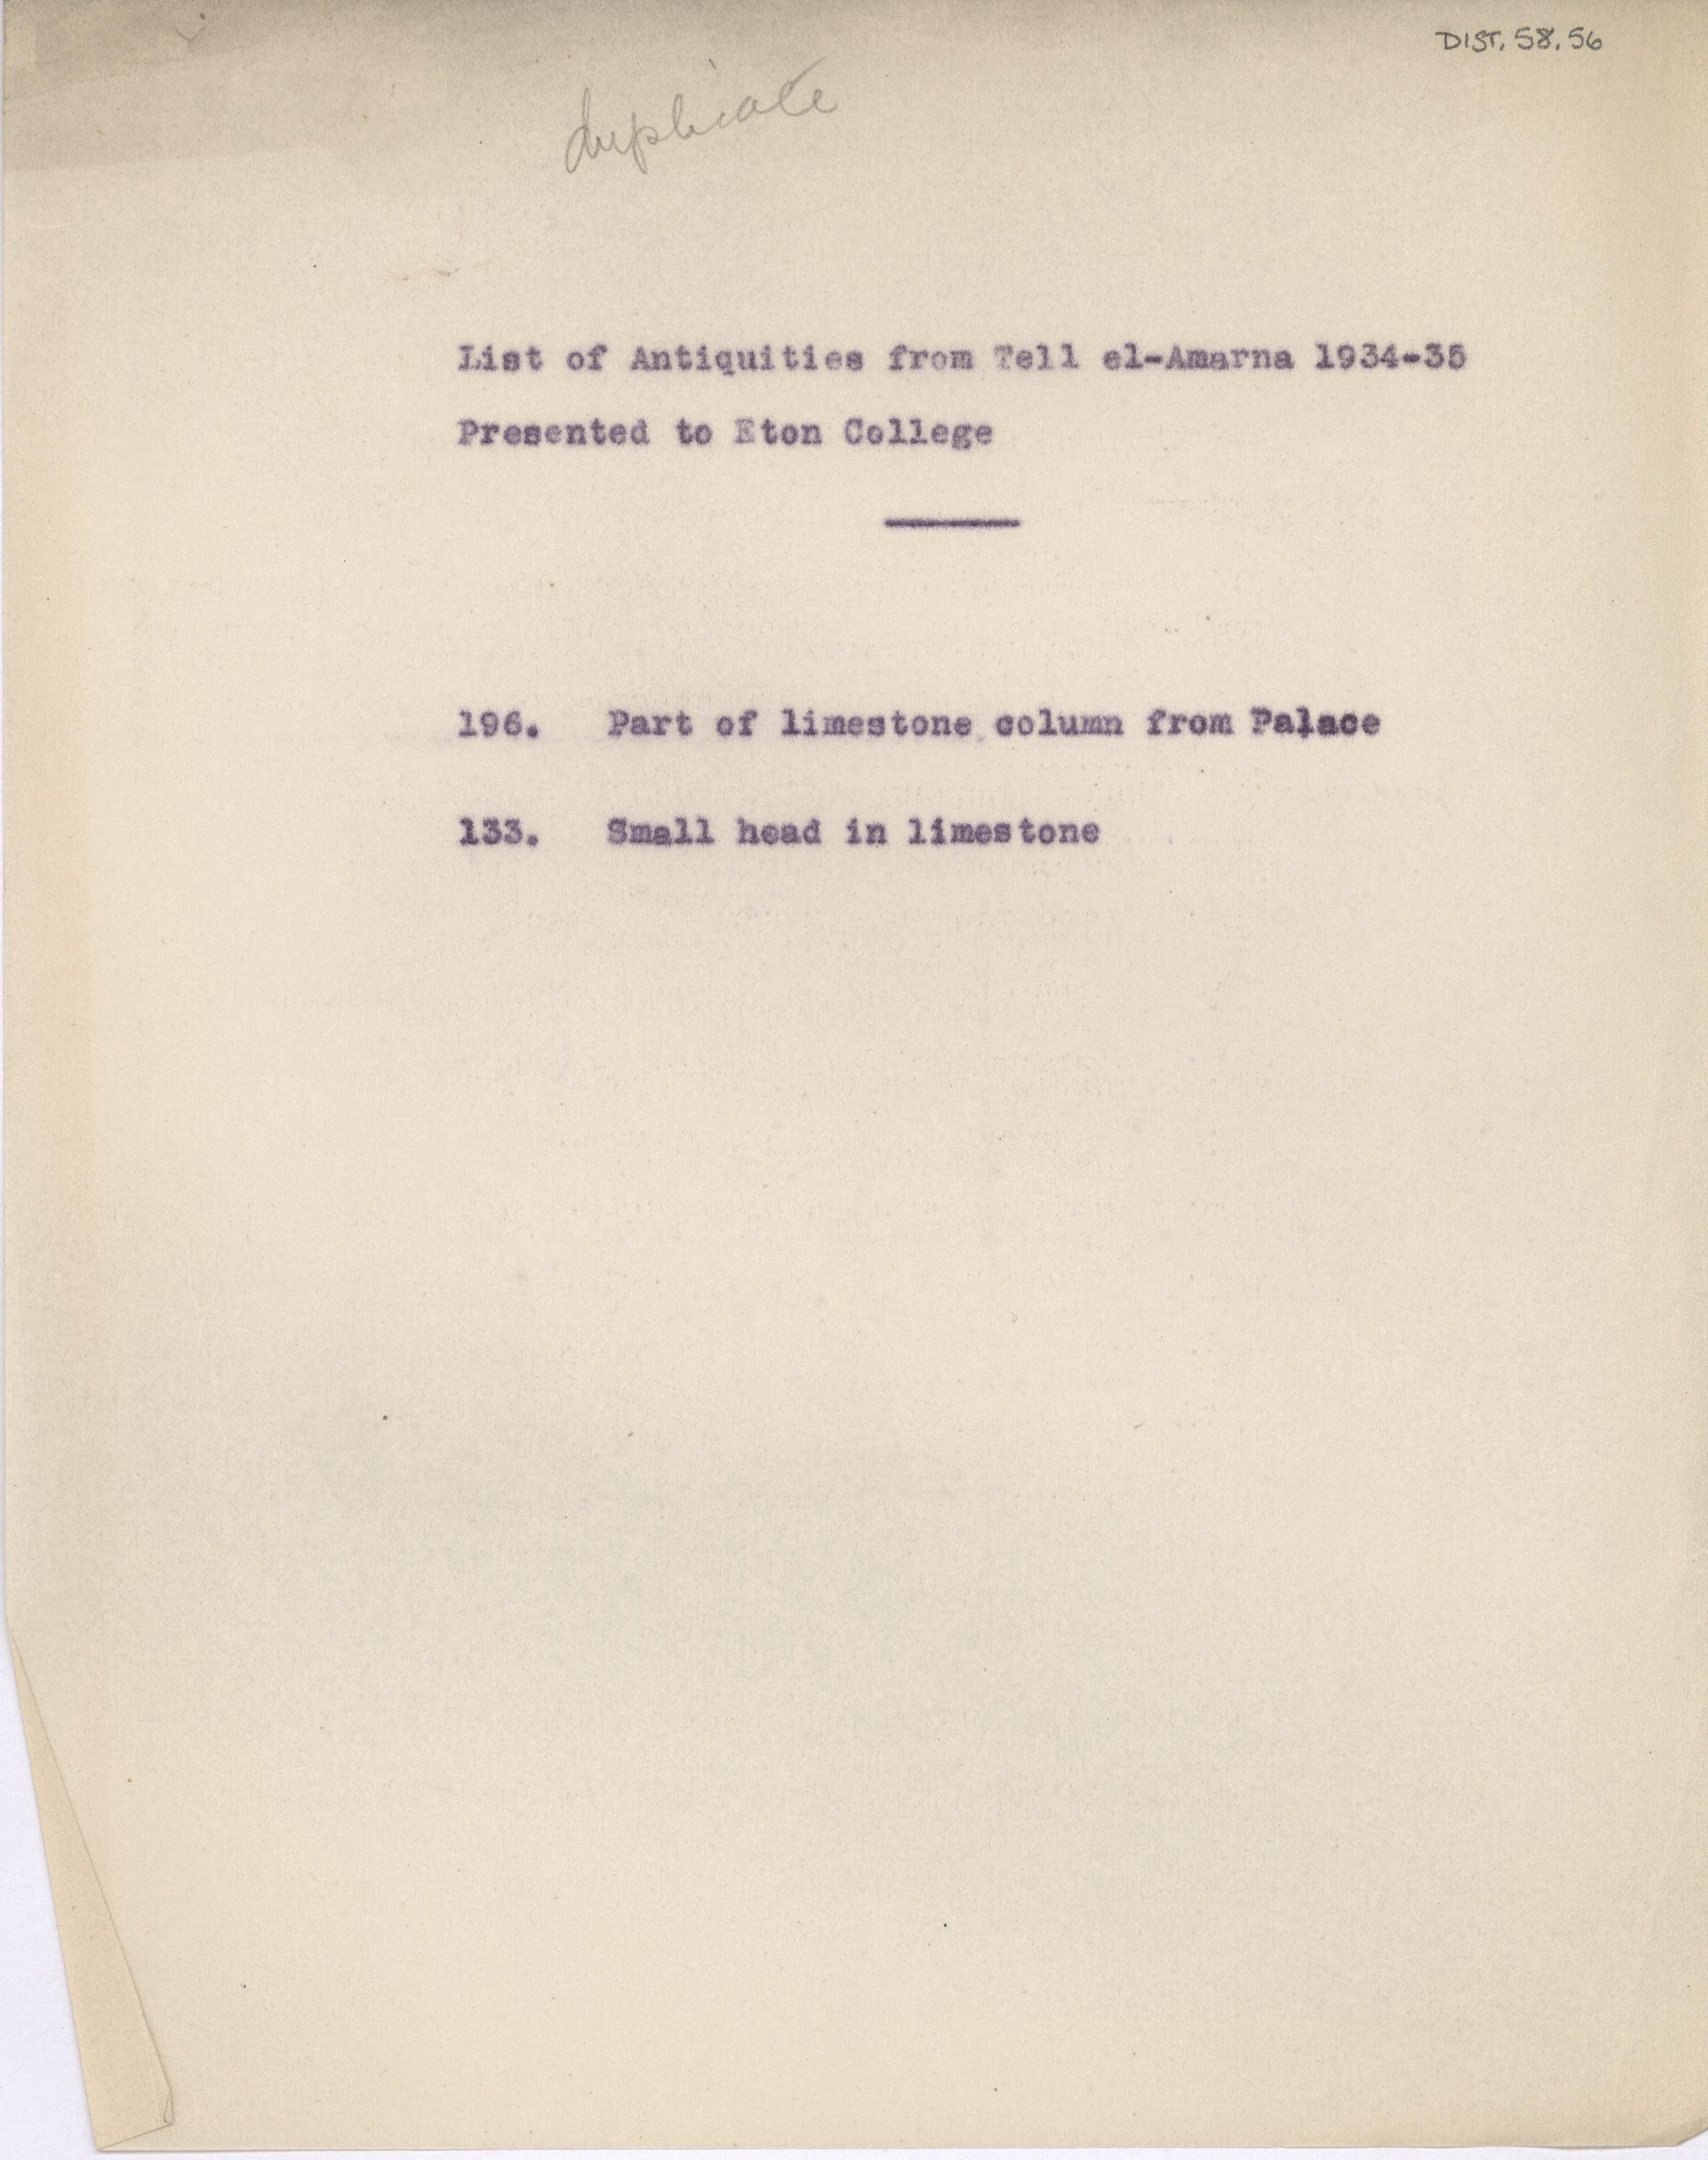 1934-35 el-Amarna DIST.58.56